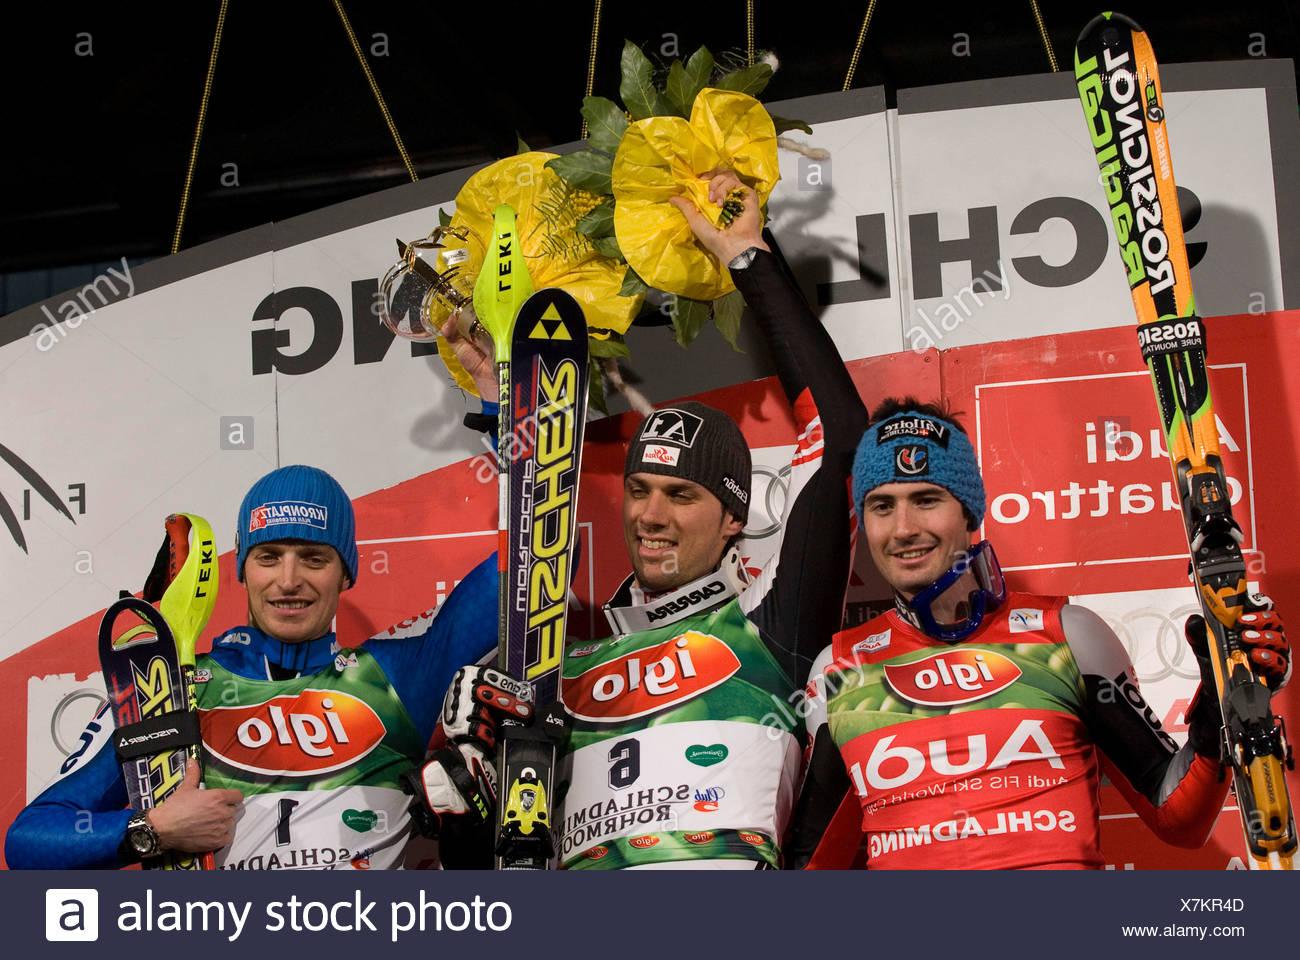 Flower ceremonie, Mario Matt, Jean-Baptist Grange (L), Manfred Moelgg (R), FIS Ski Worldcup, Slalom men, Schladming, 2008, Nigh - Stock Image